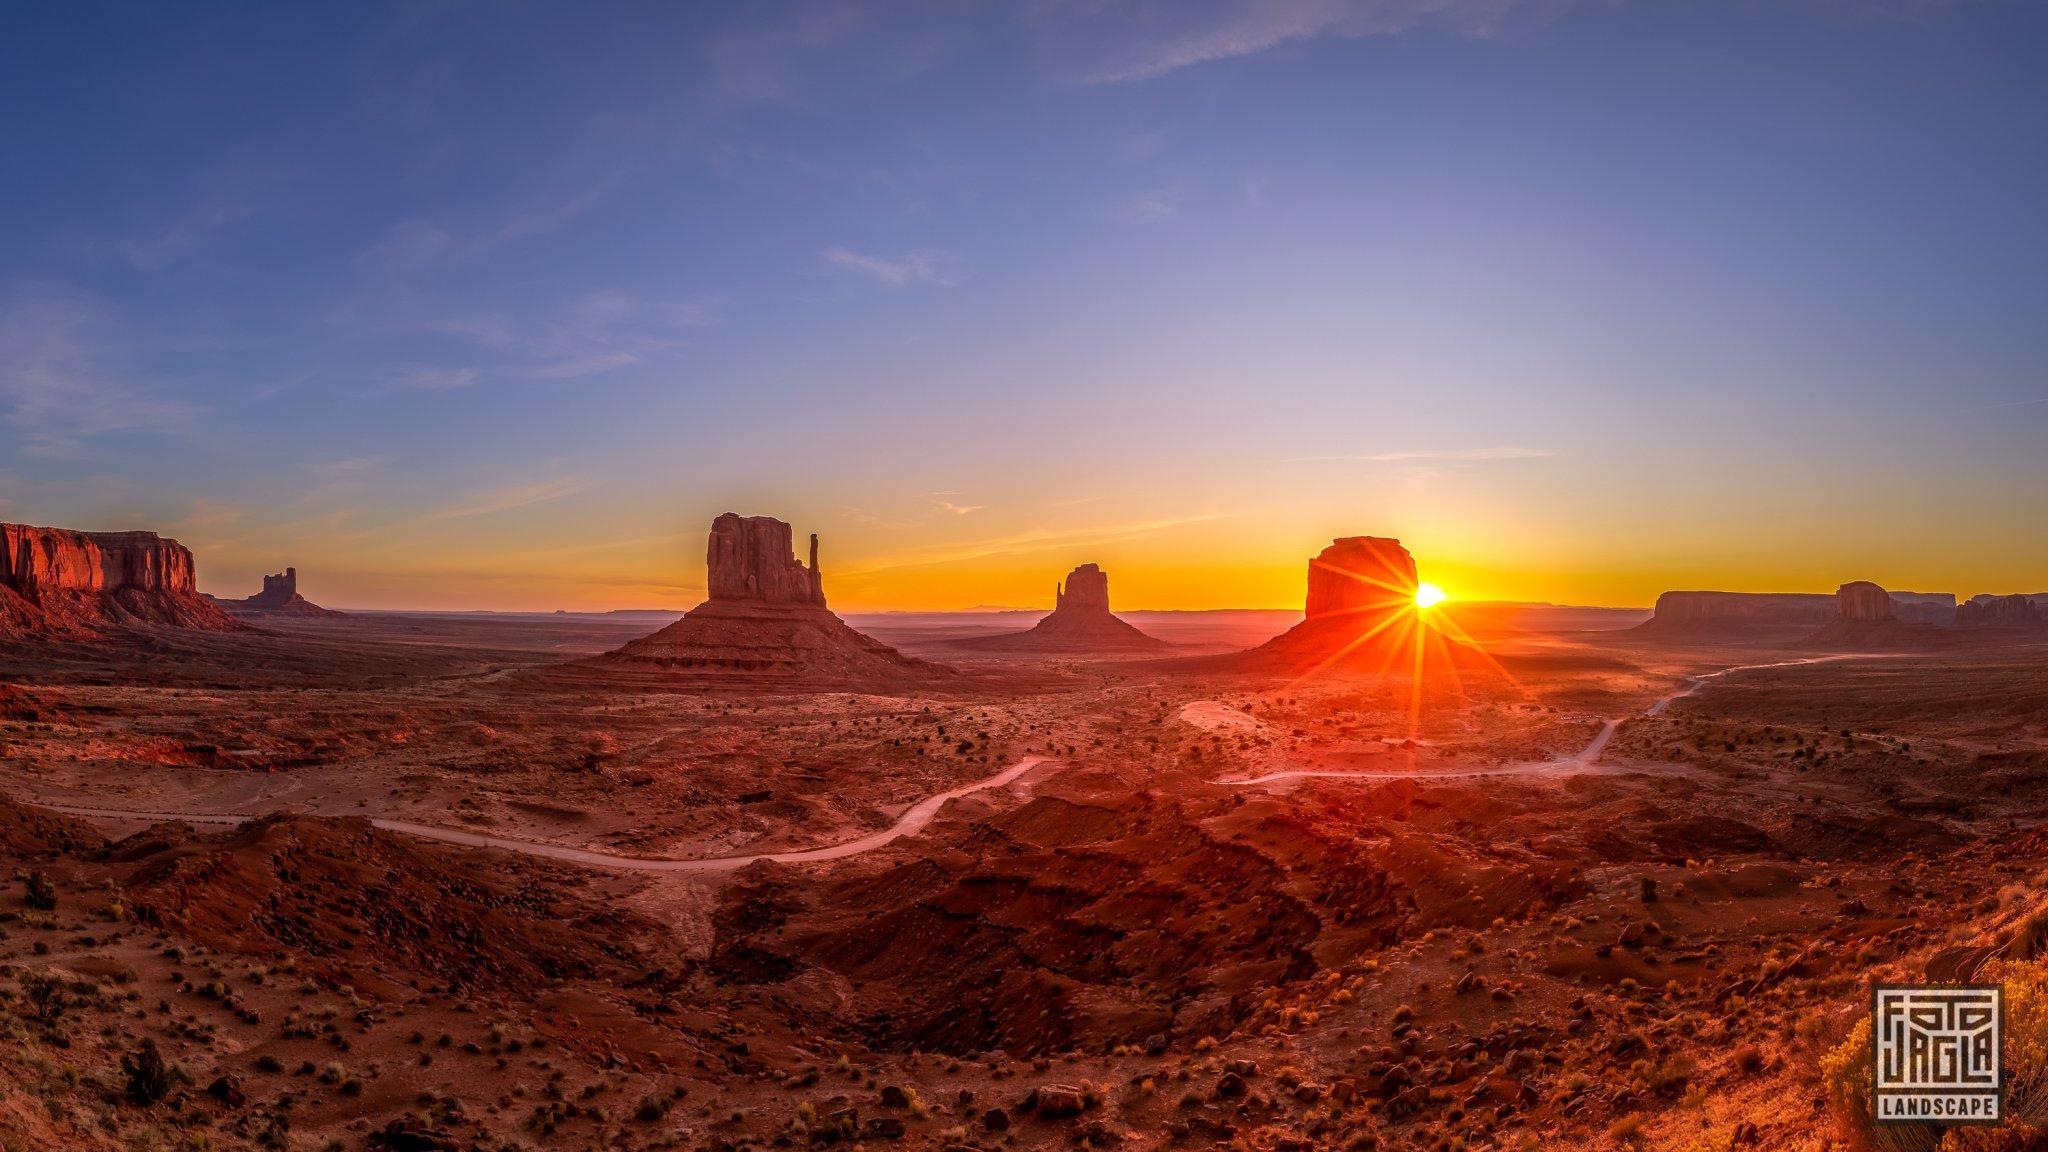 Beautiful sunrise at Monument Valley Arizona, USA 2019